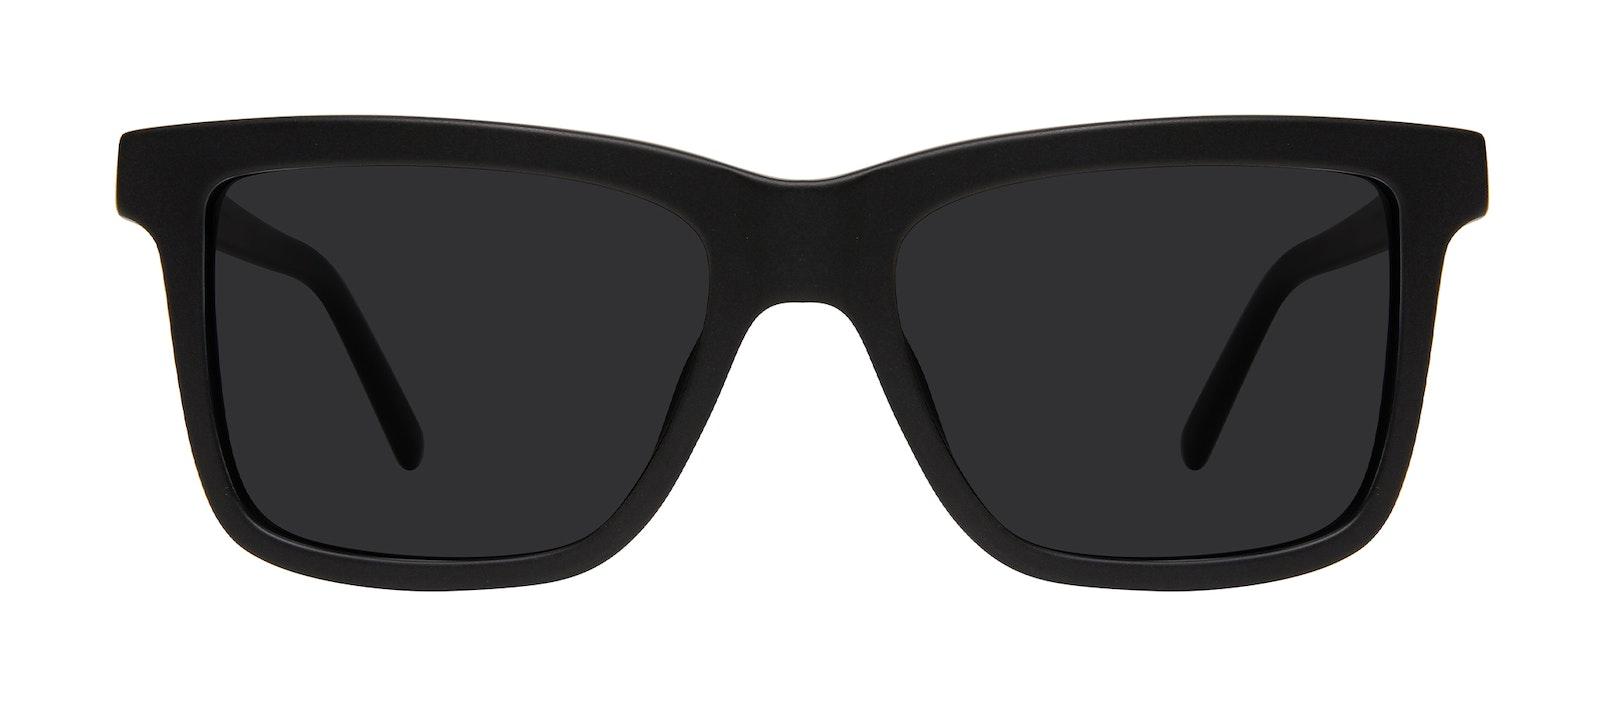 Affordable Fashion Glasses Square Sunglasses Men Elite Matte Black Front